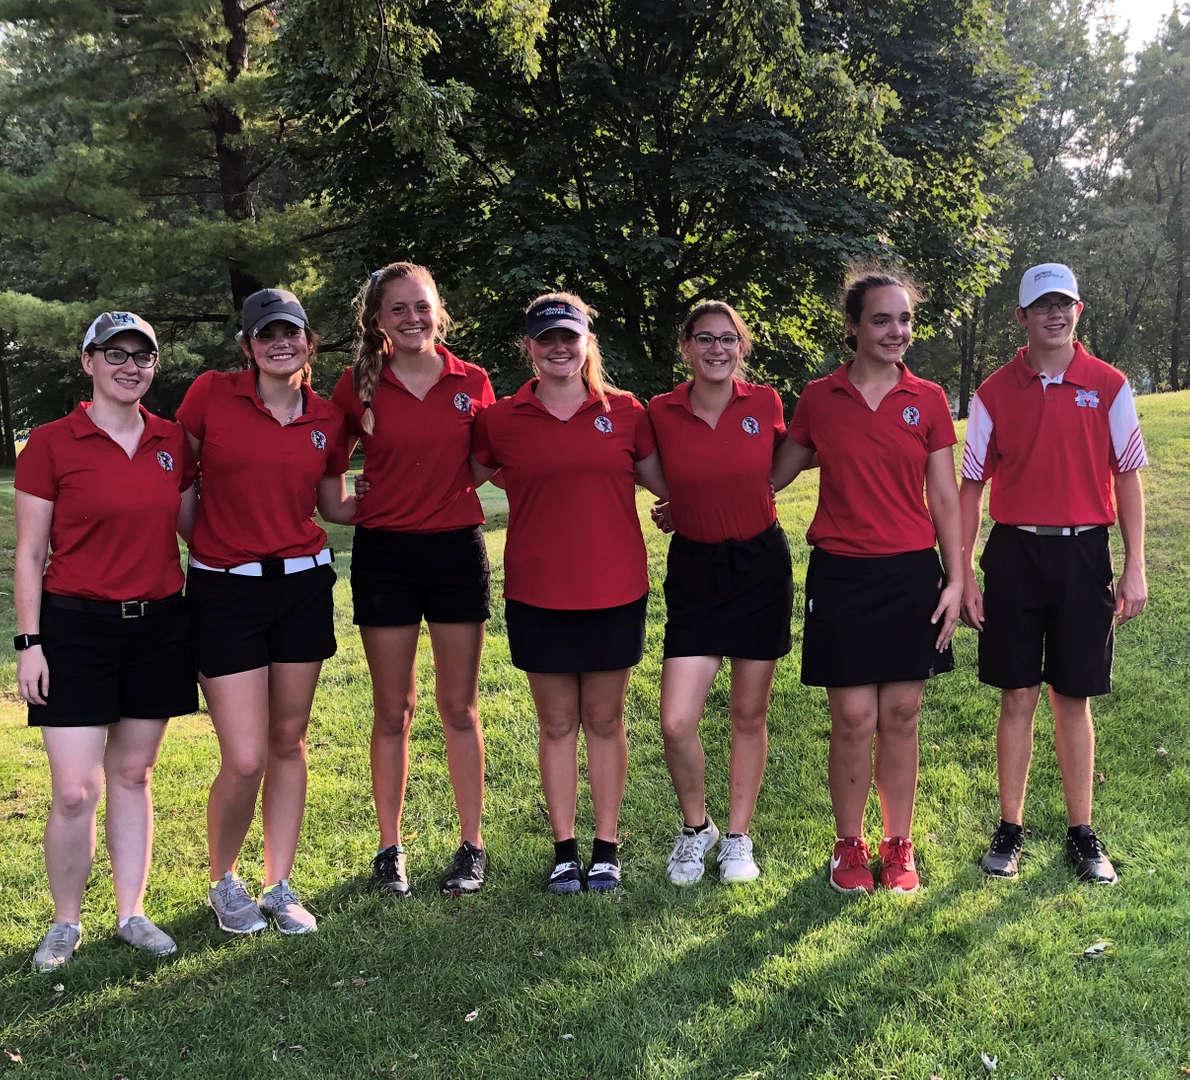 Girls golf team photo.